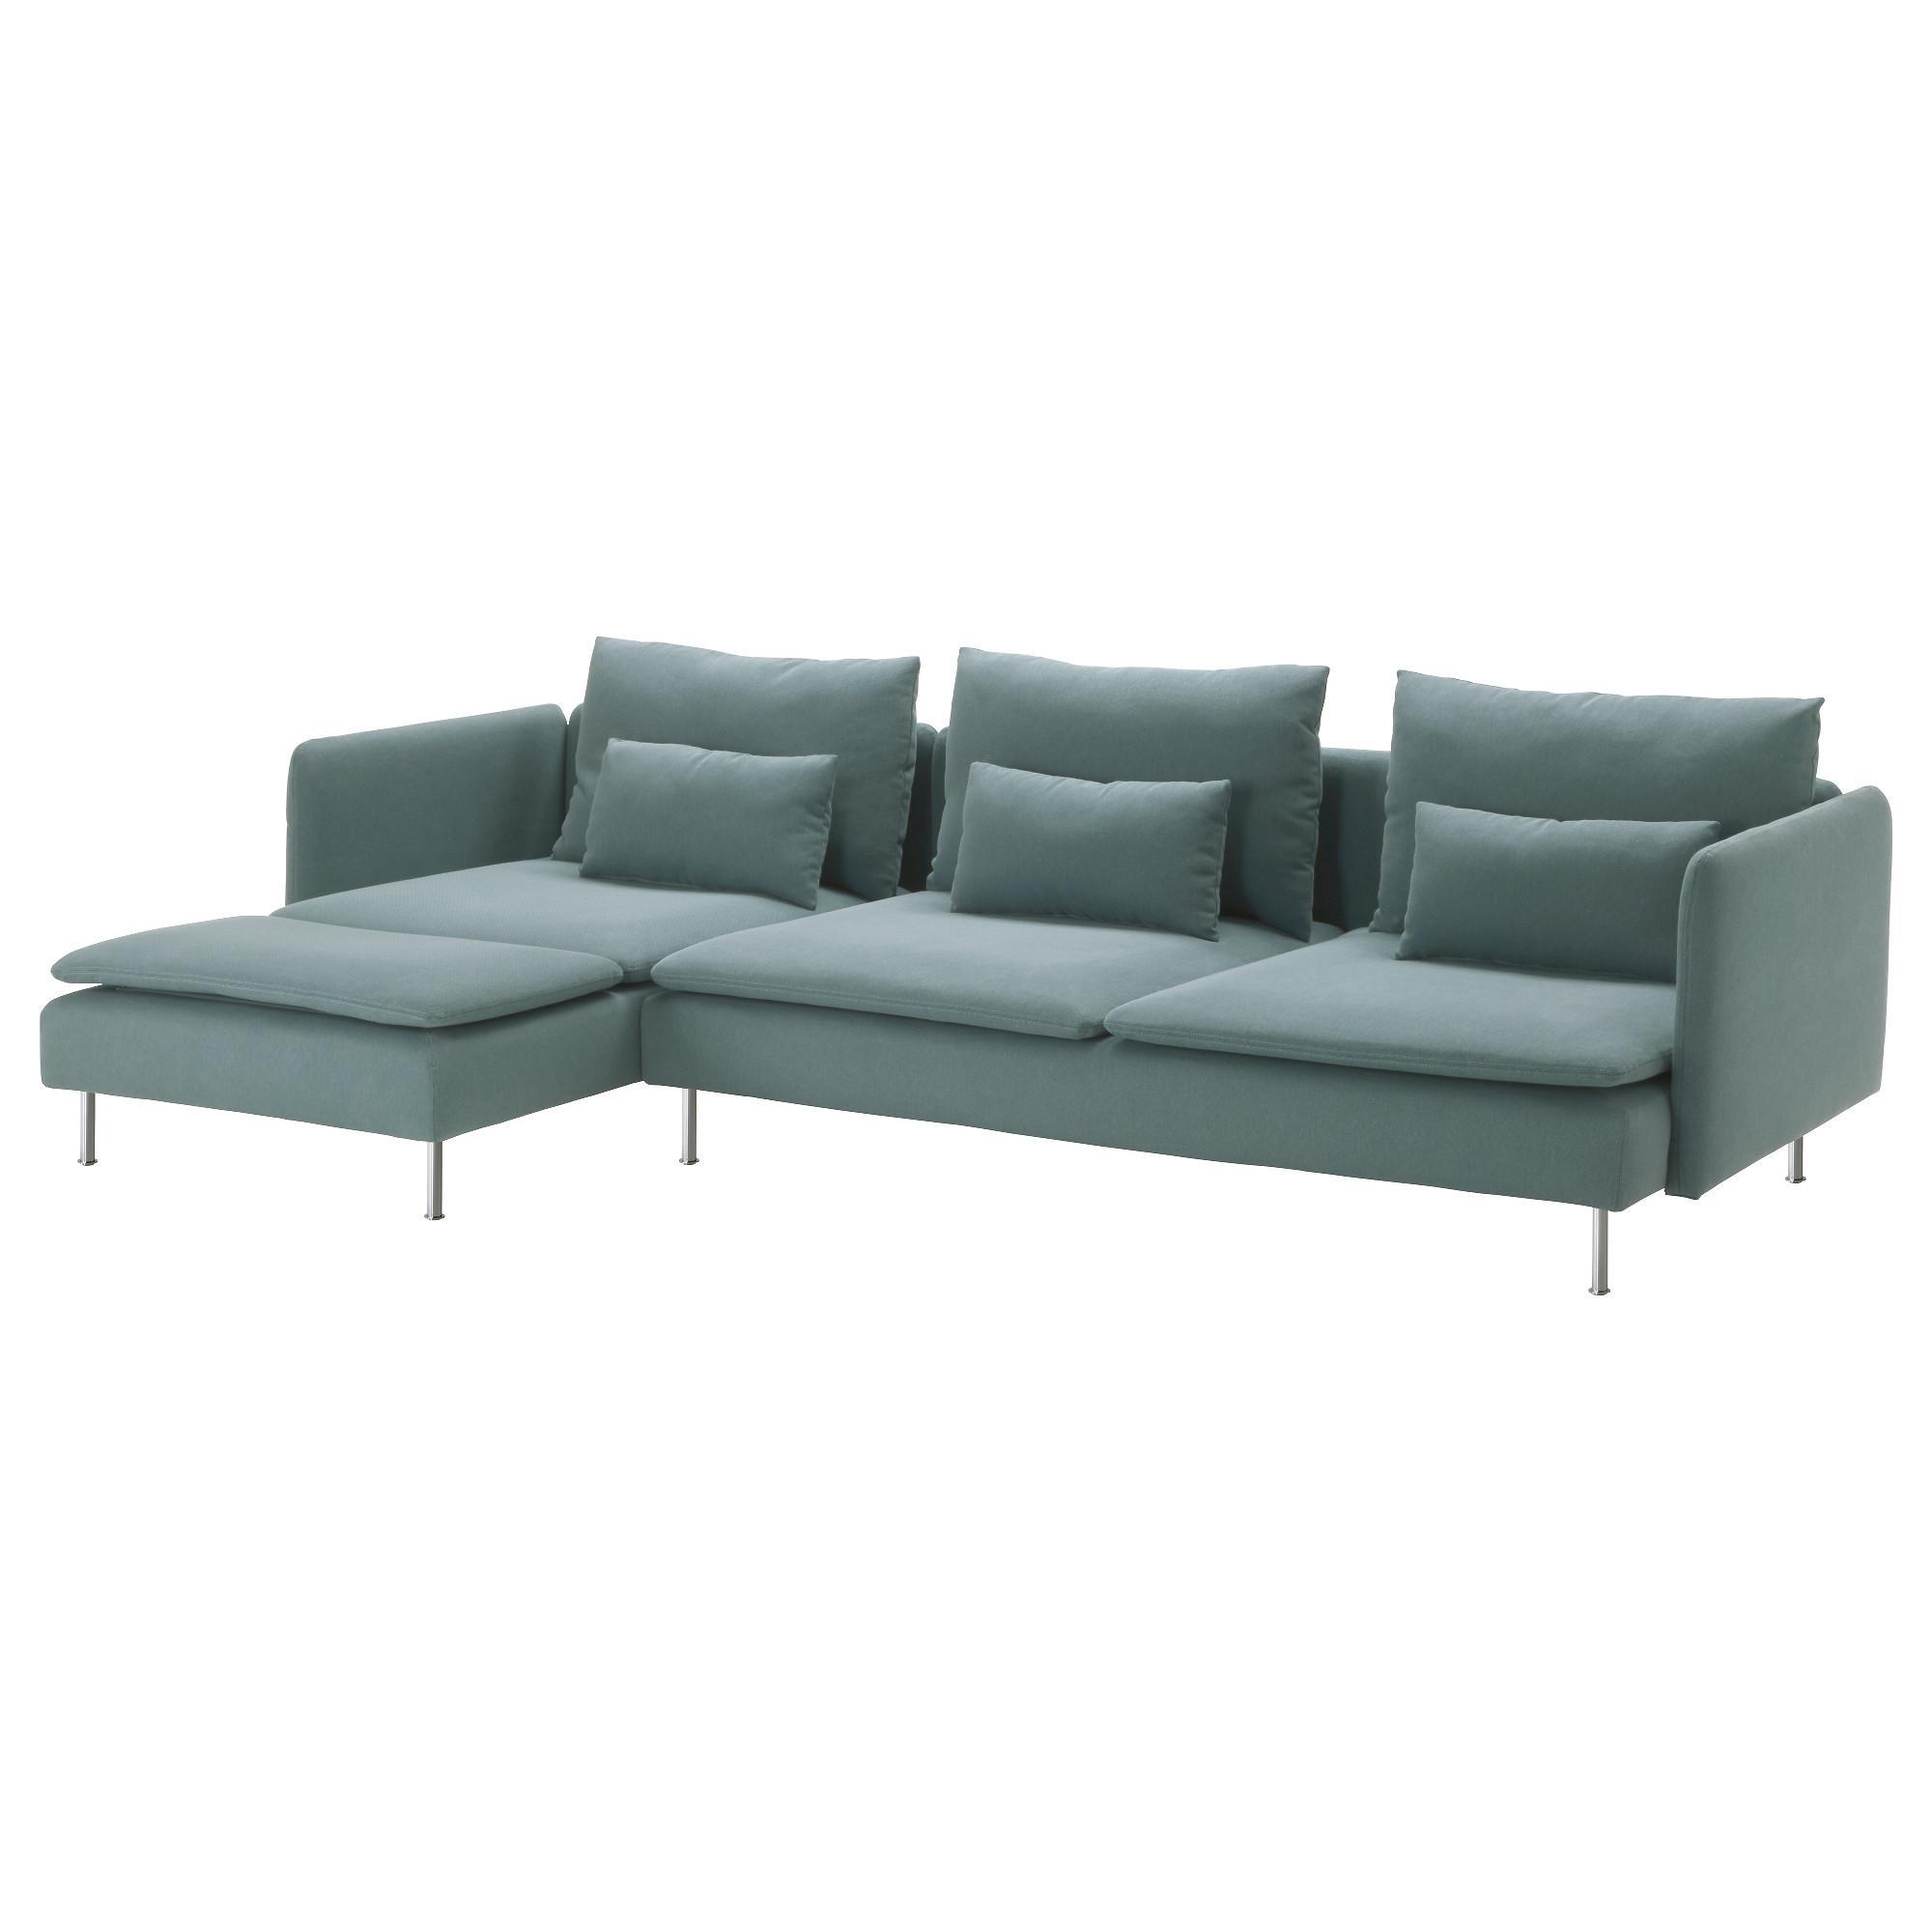 Modular Sofas & Sectionals – Ikea With Regard To Modular Sofas (View 14 of 20)